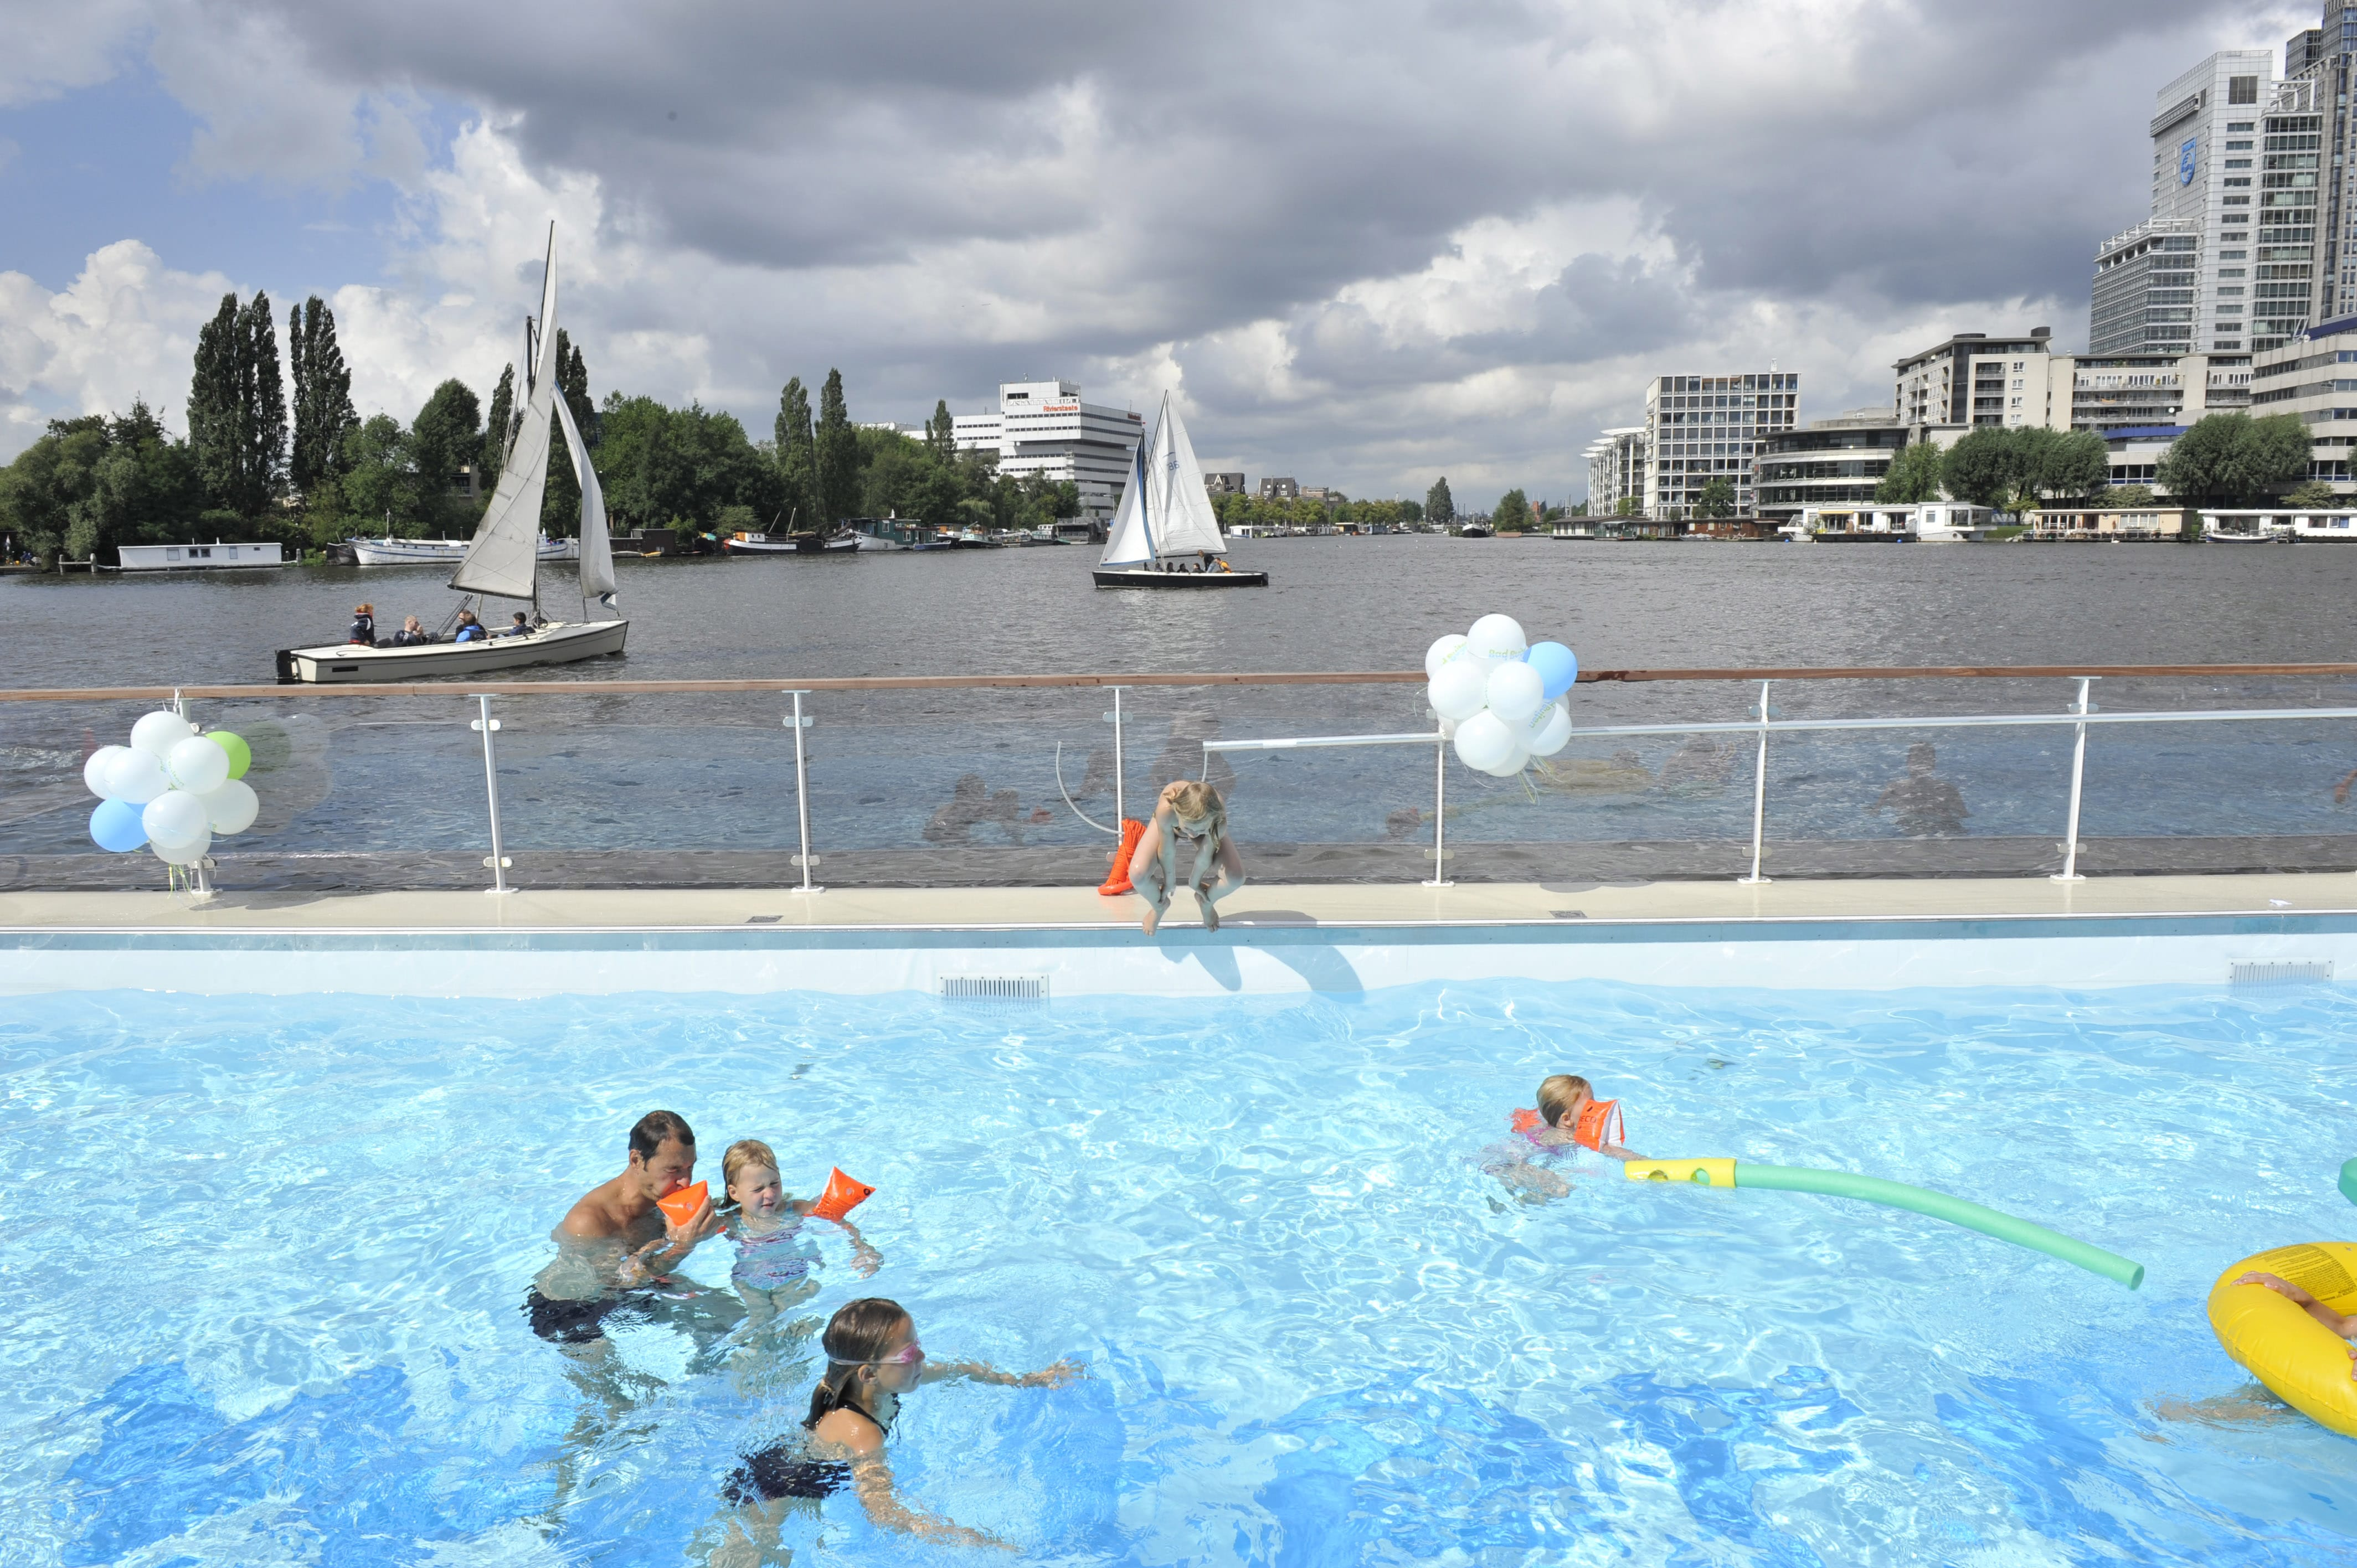 Drijvend zwembad Waternet te Amsterdam